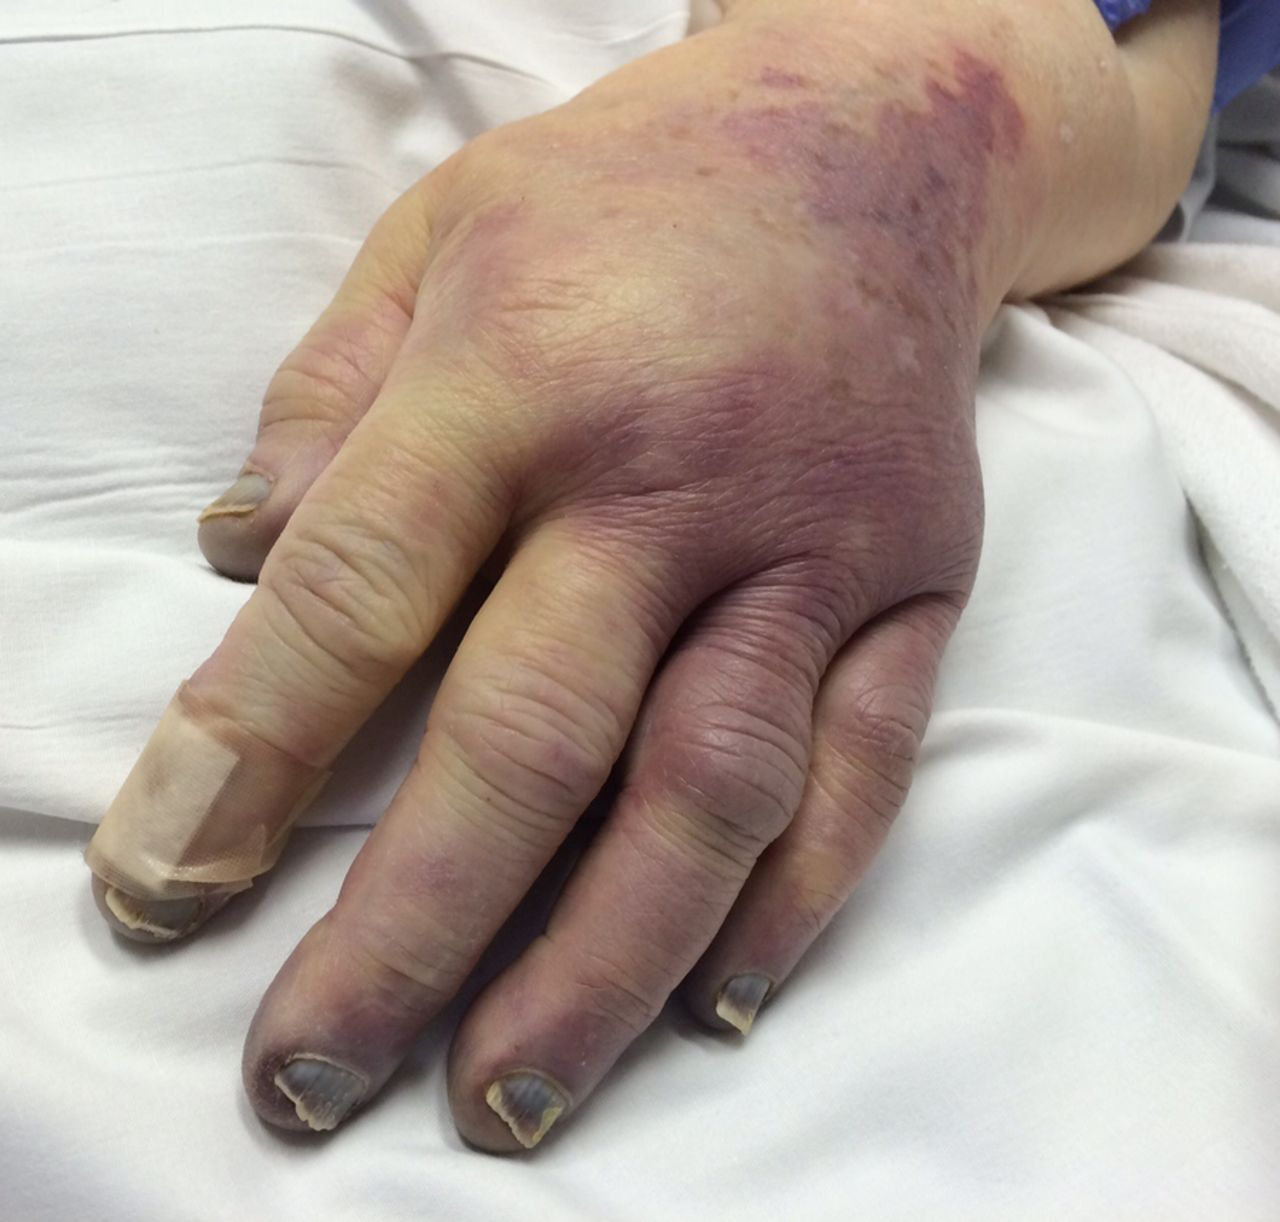 purpura fulminans and severe sepsis due to pasteurella